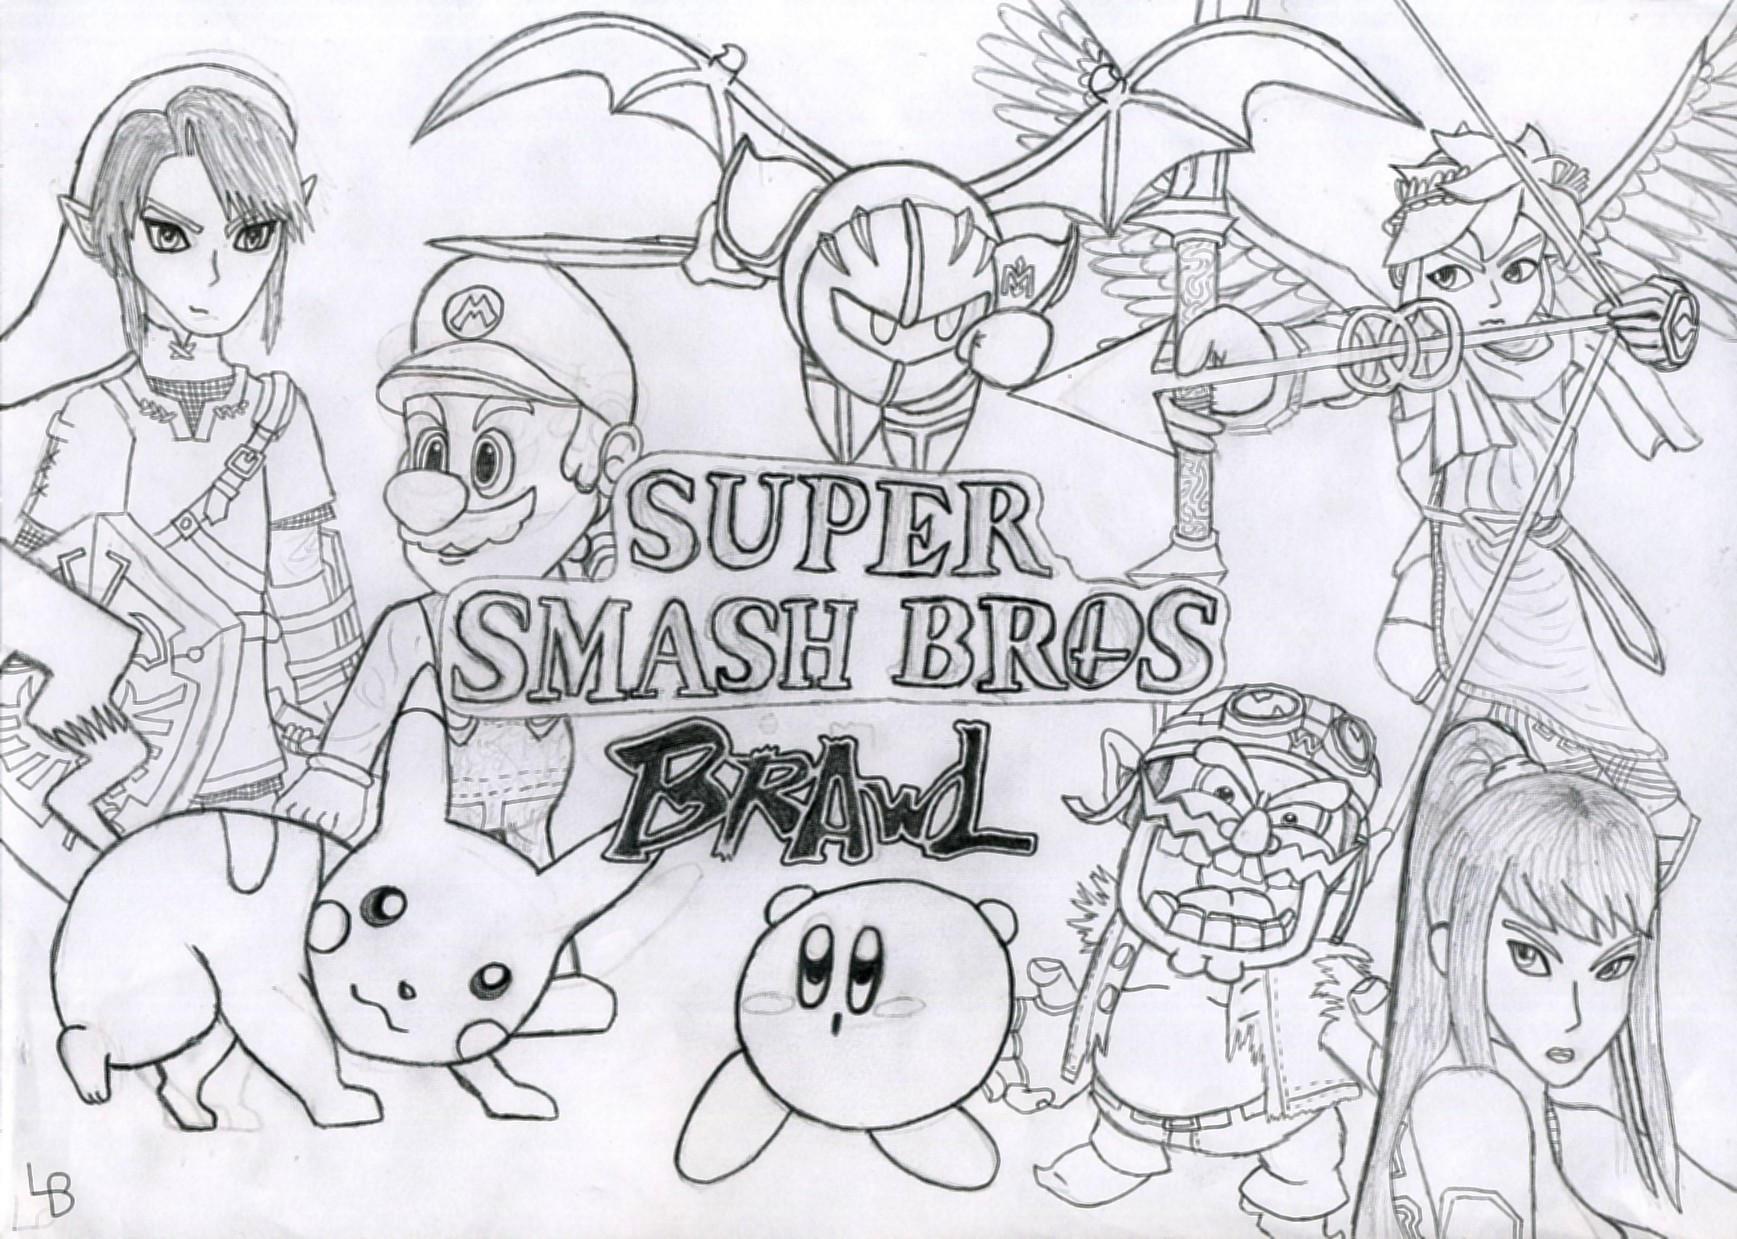 super smash bros brawl coloring pages super smash bros brawl by luifex on deviantart